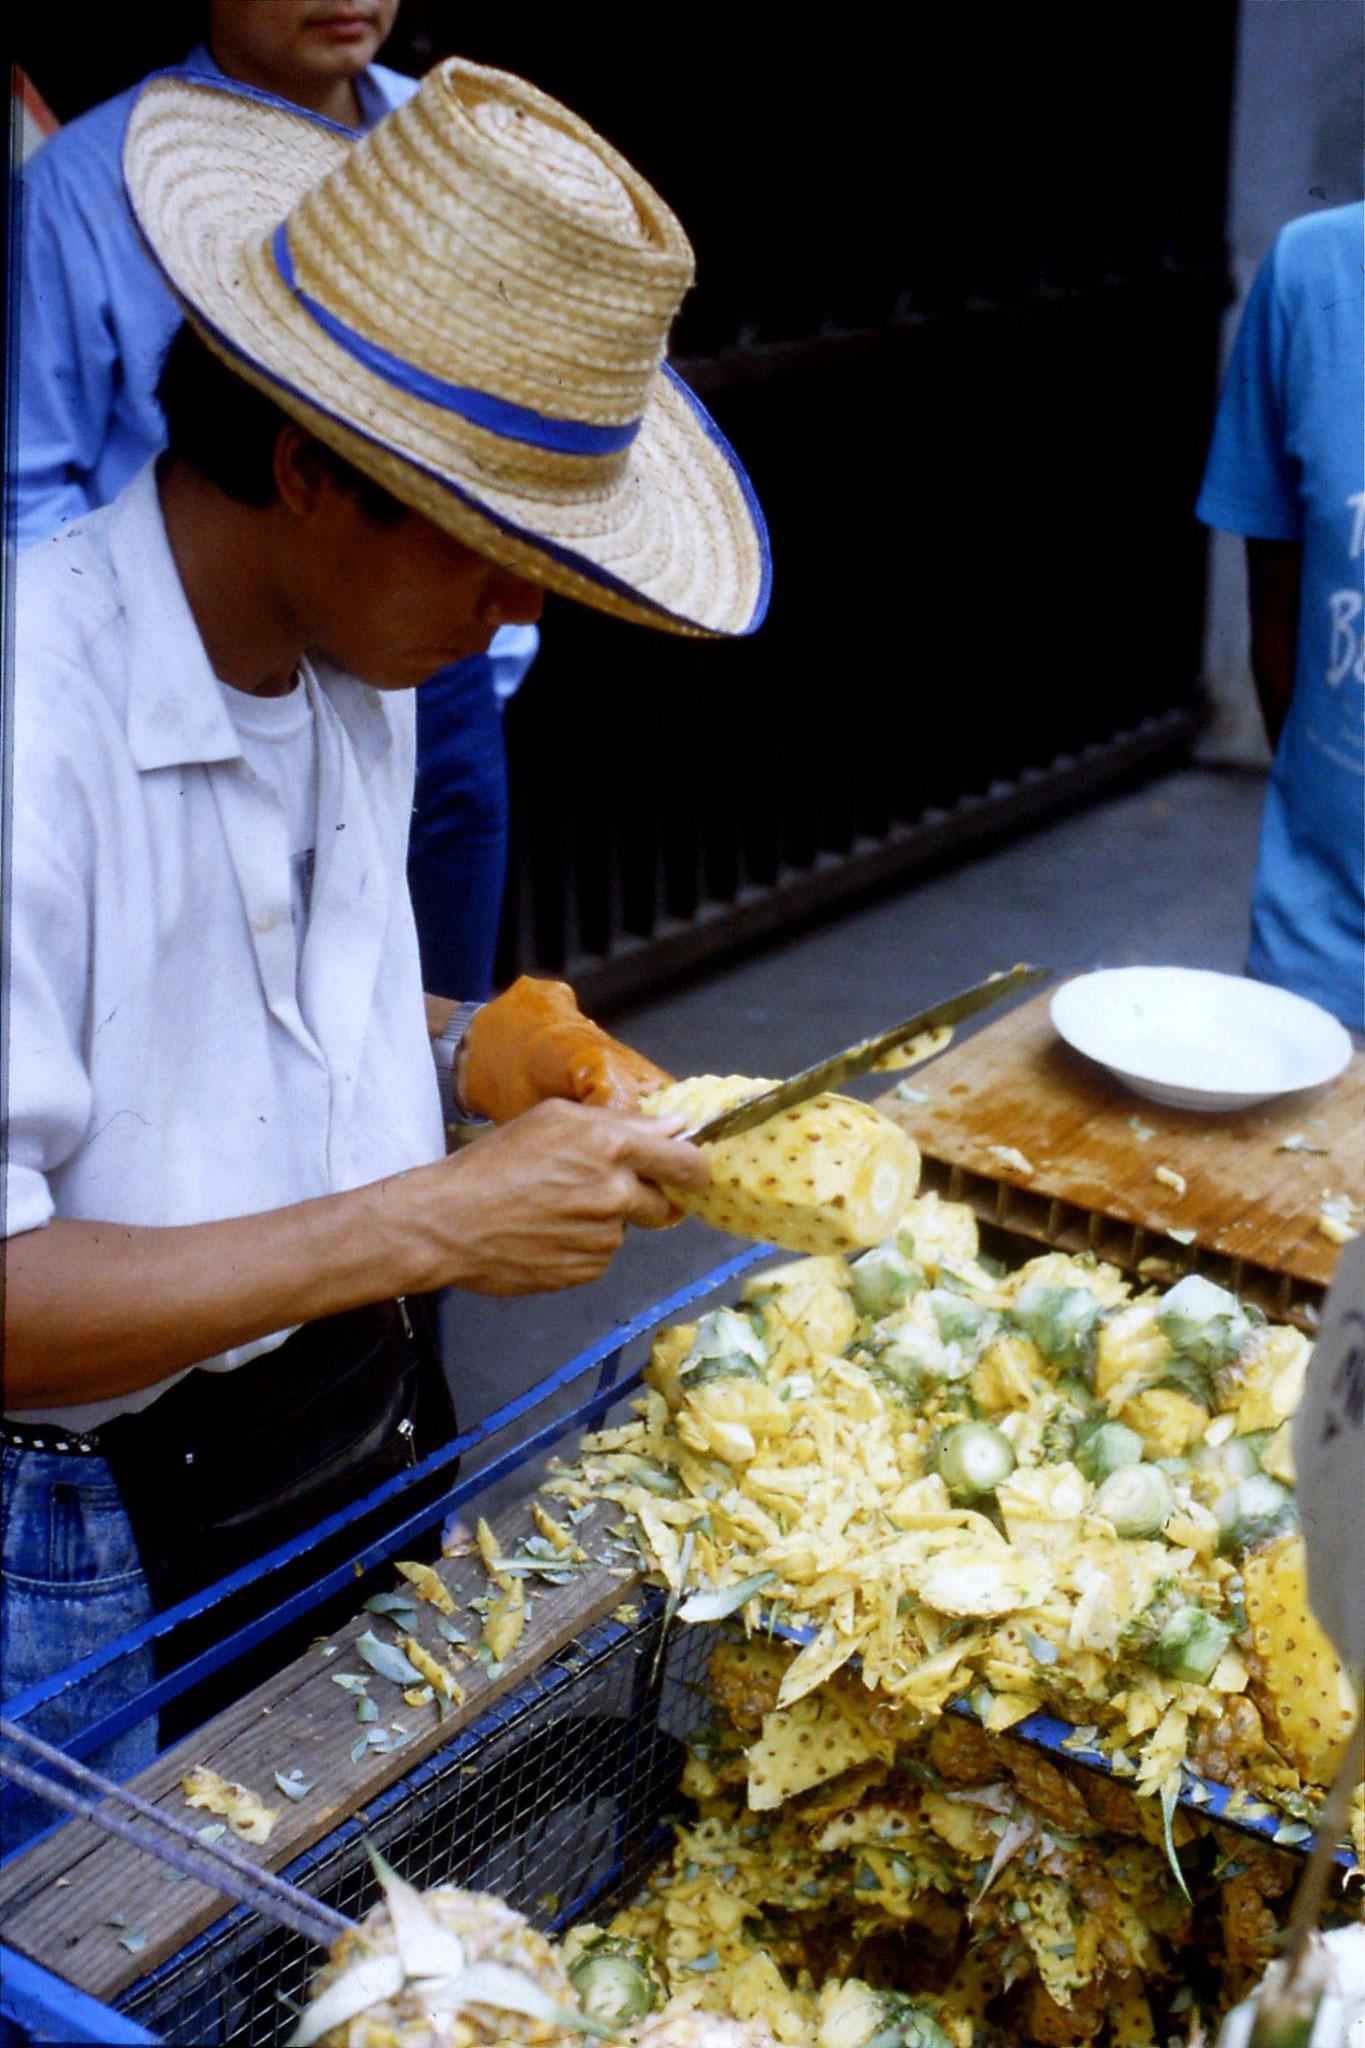 19/5/1990: 1: Bangkok pineapple vendor